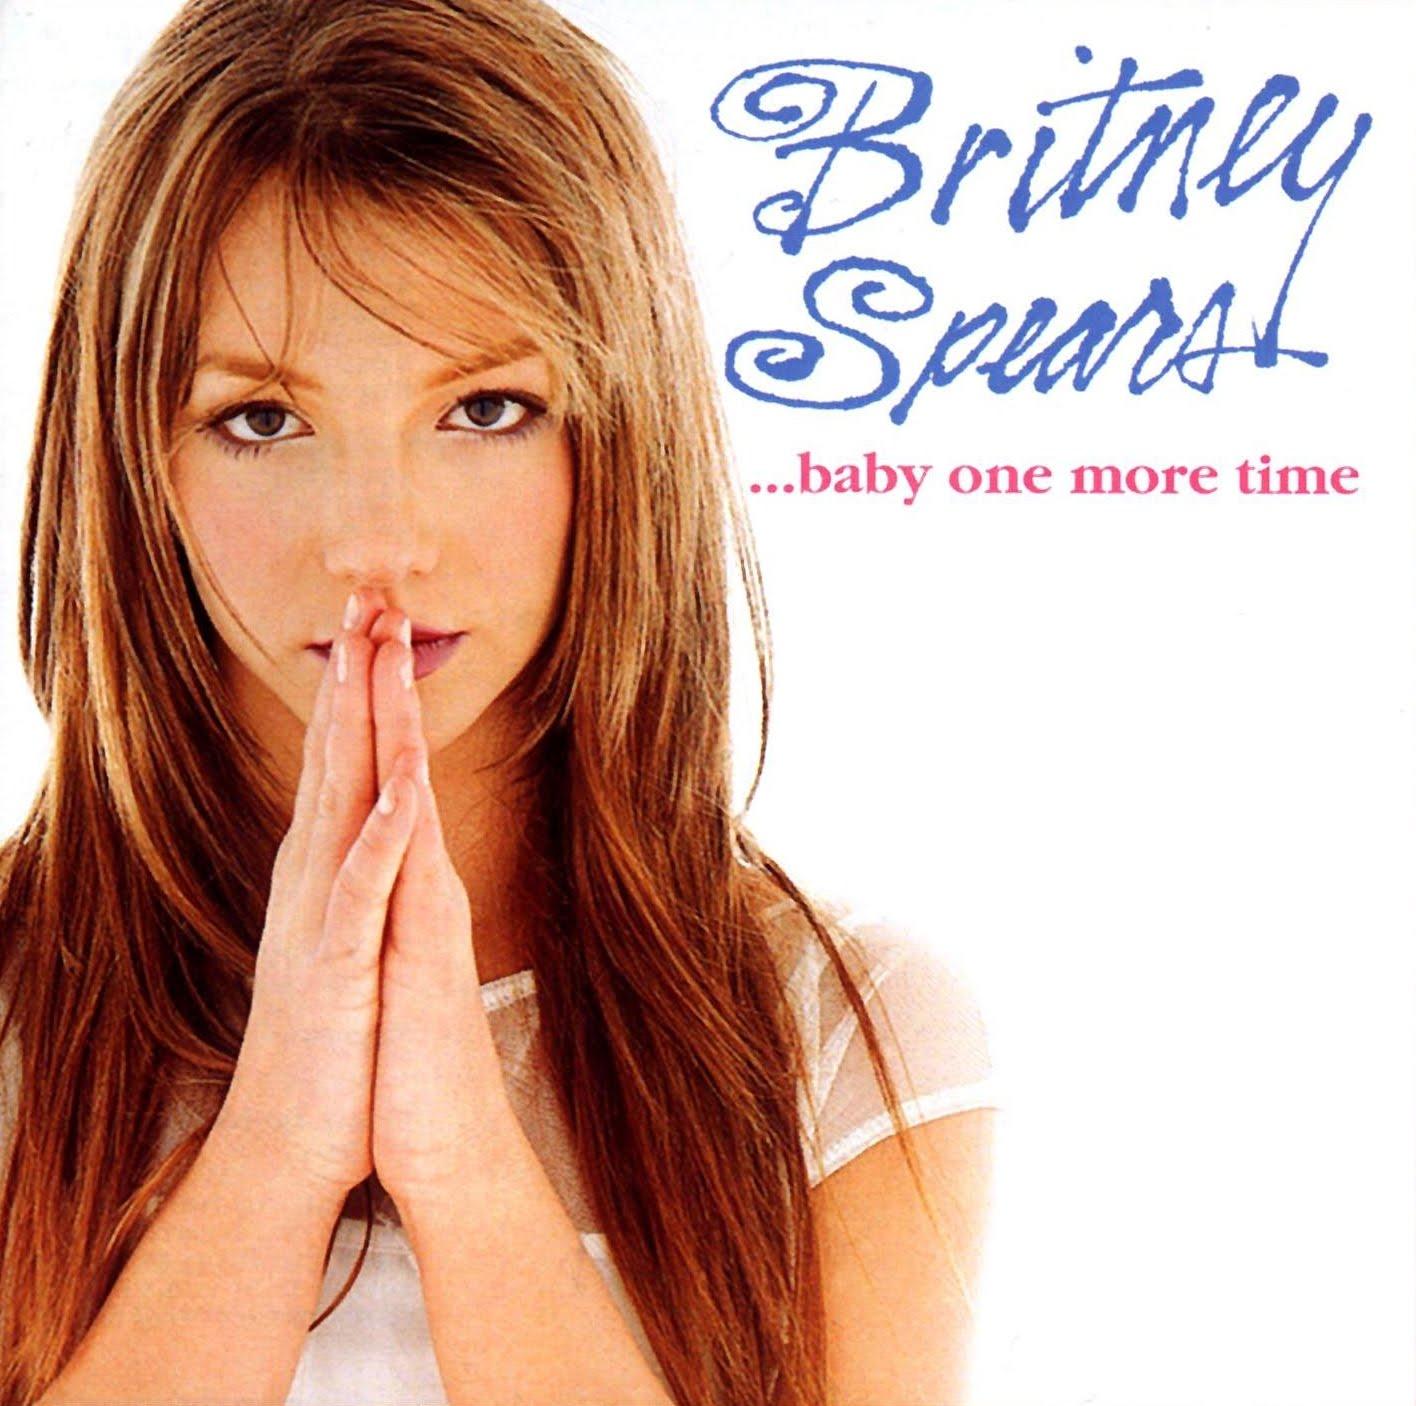 http://4.bp.blogspot.com/-xUY_XwZzlCs/TZ9UdP2SLVI/AAAAAAAATgI/WZmF3SJpI80/s1600/Britney+Spears+-+...Baby+One+More+Time+-+Front.jpg